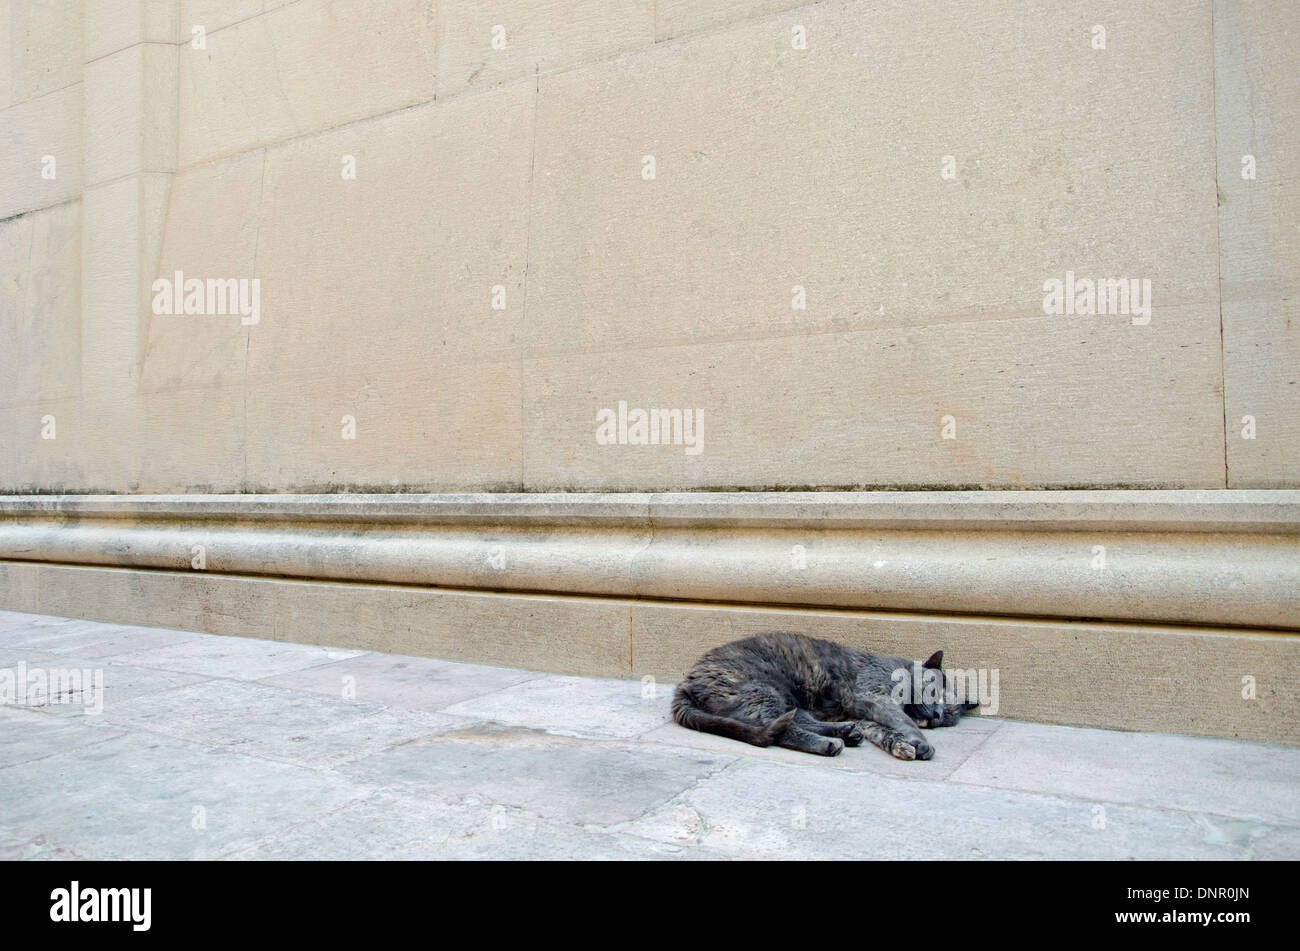 a sleeping street cat Stock Photo